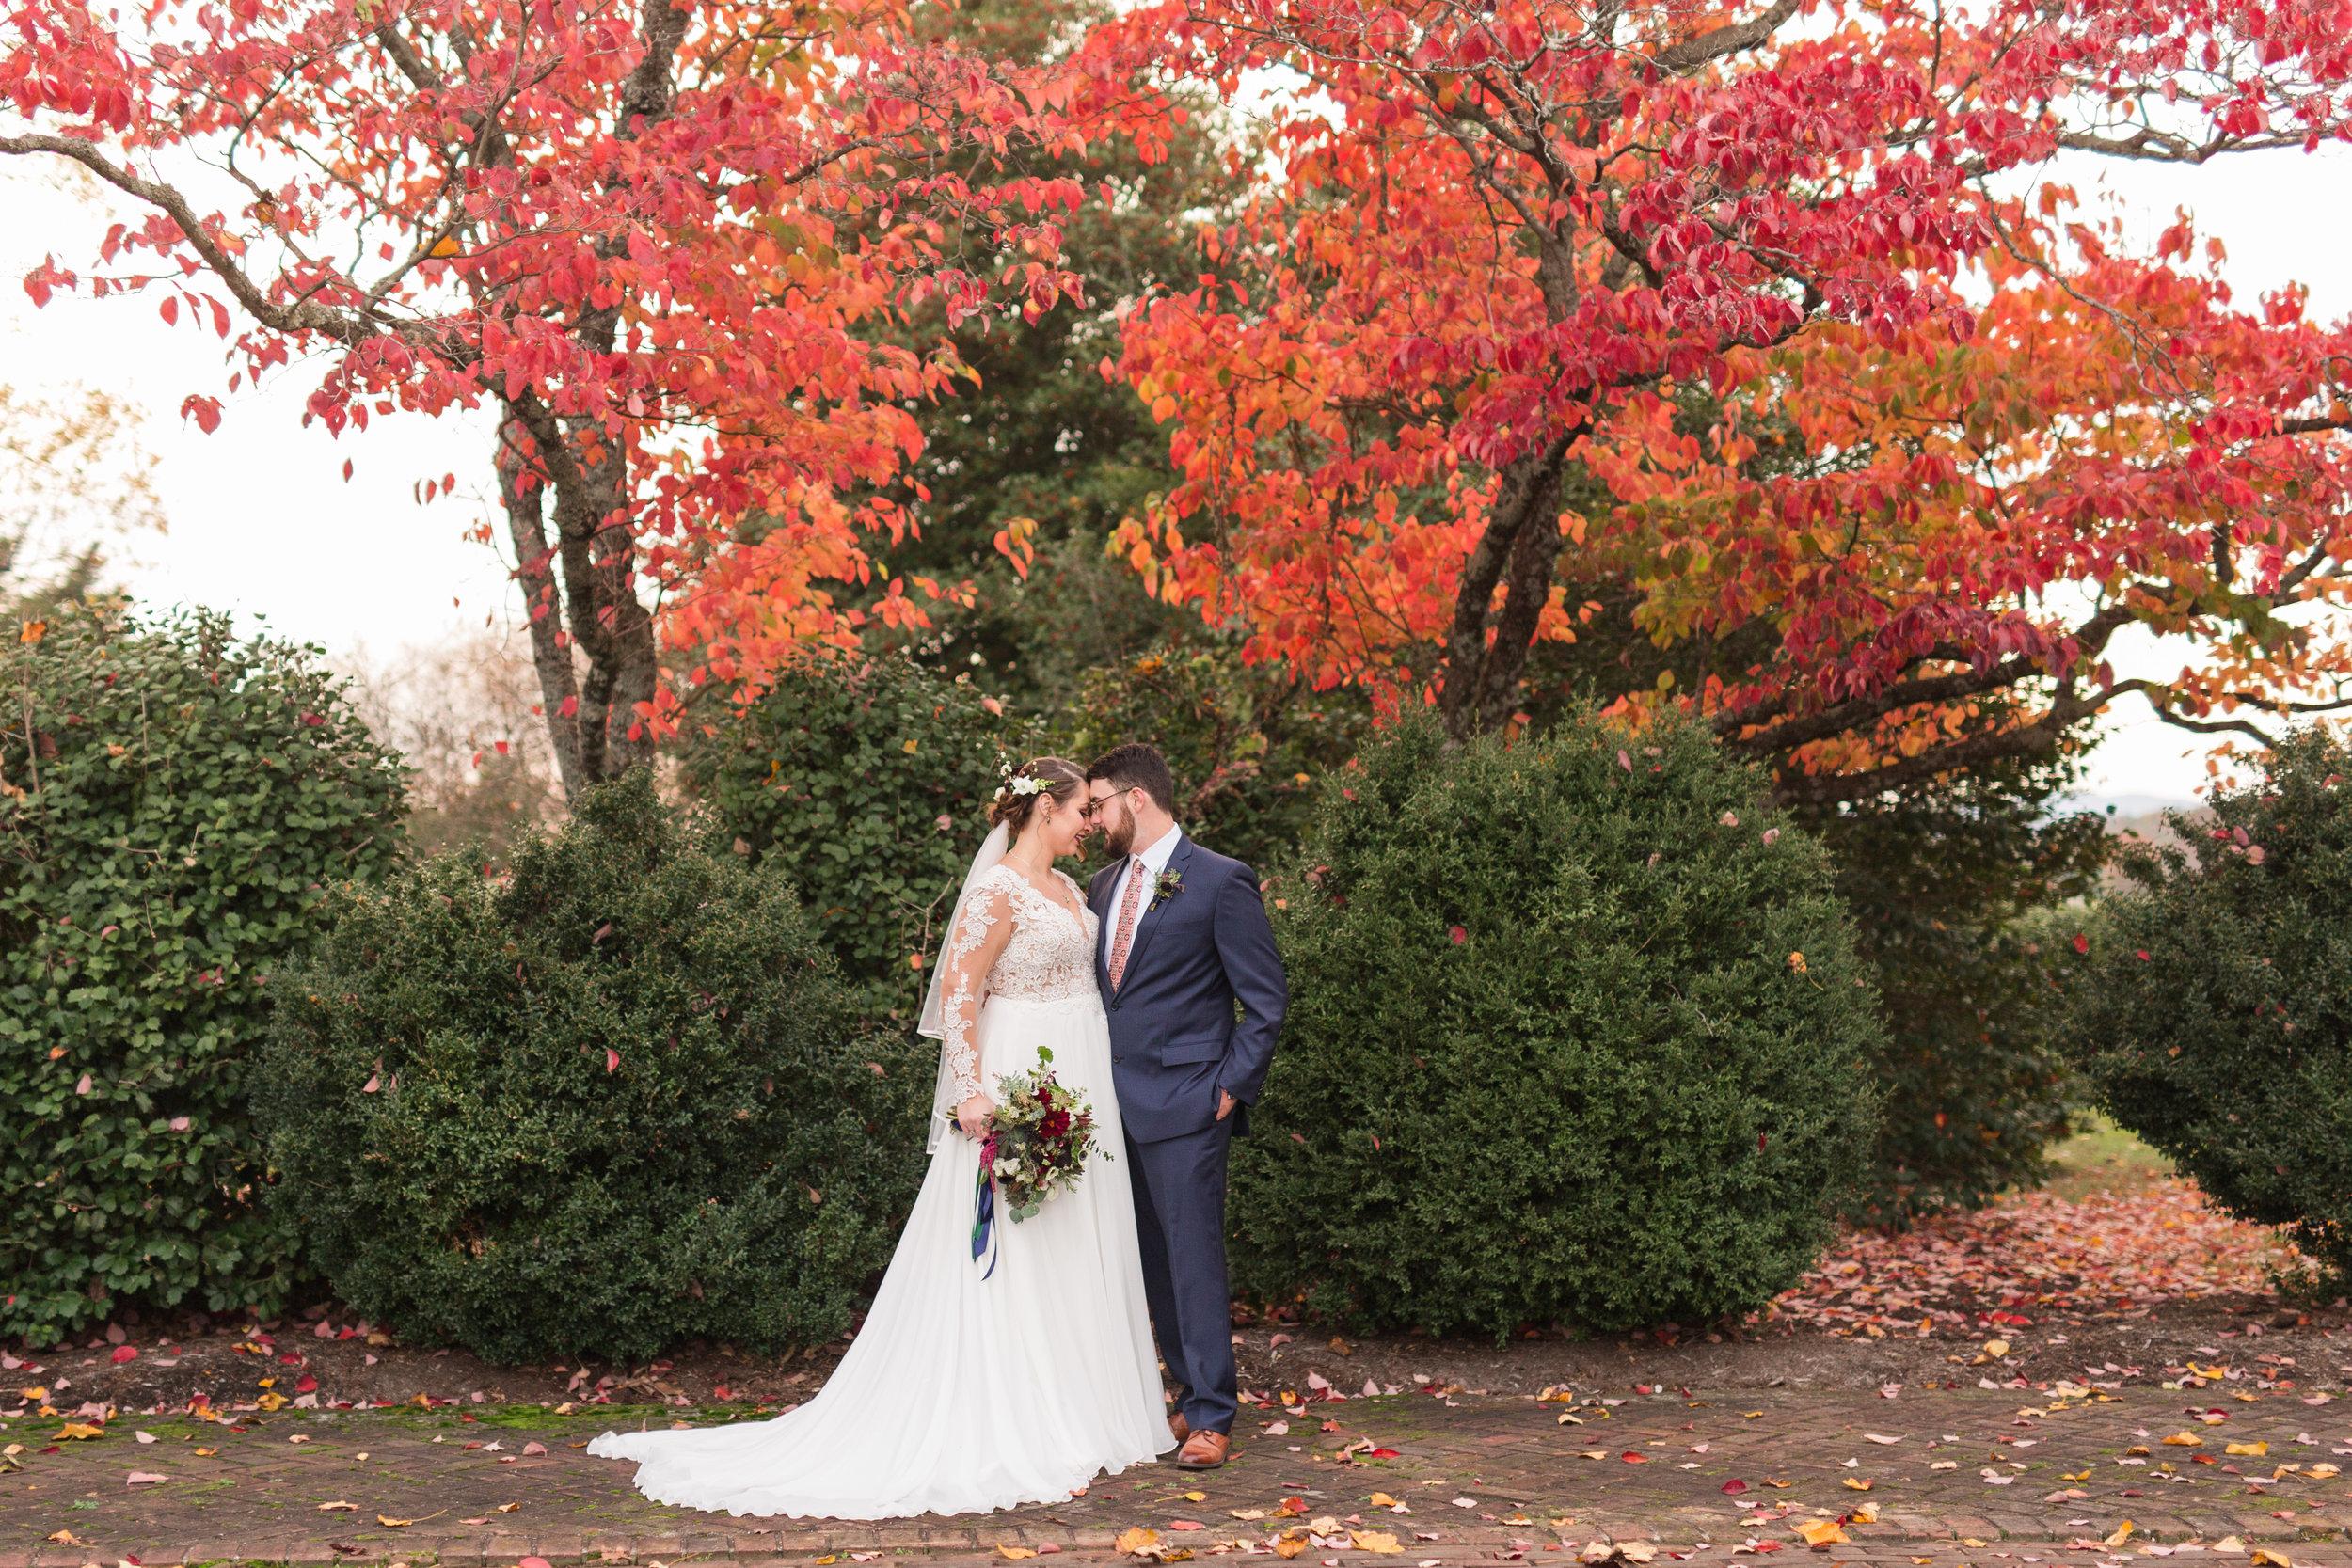 Lynchburg and Charlottesville Wedding and Portrait Photographer    The Trivium Estate Wedding    www.ashleyeiban.com